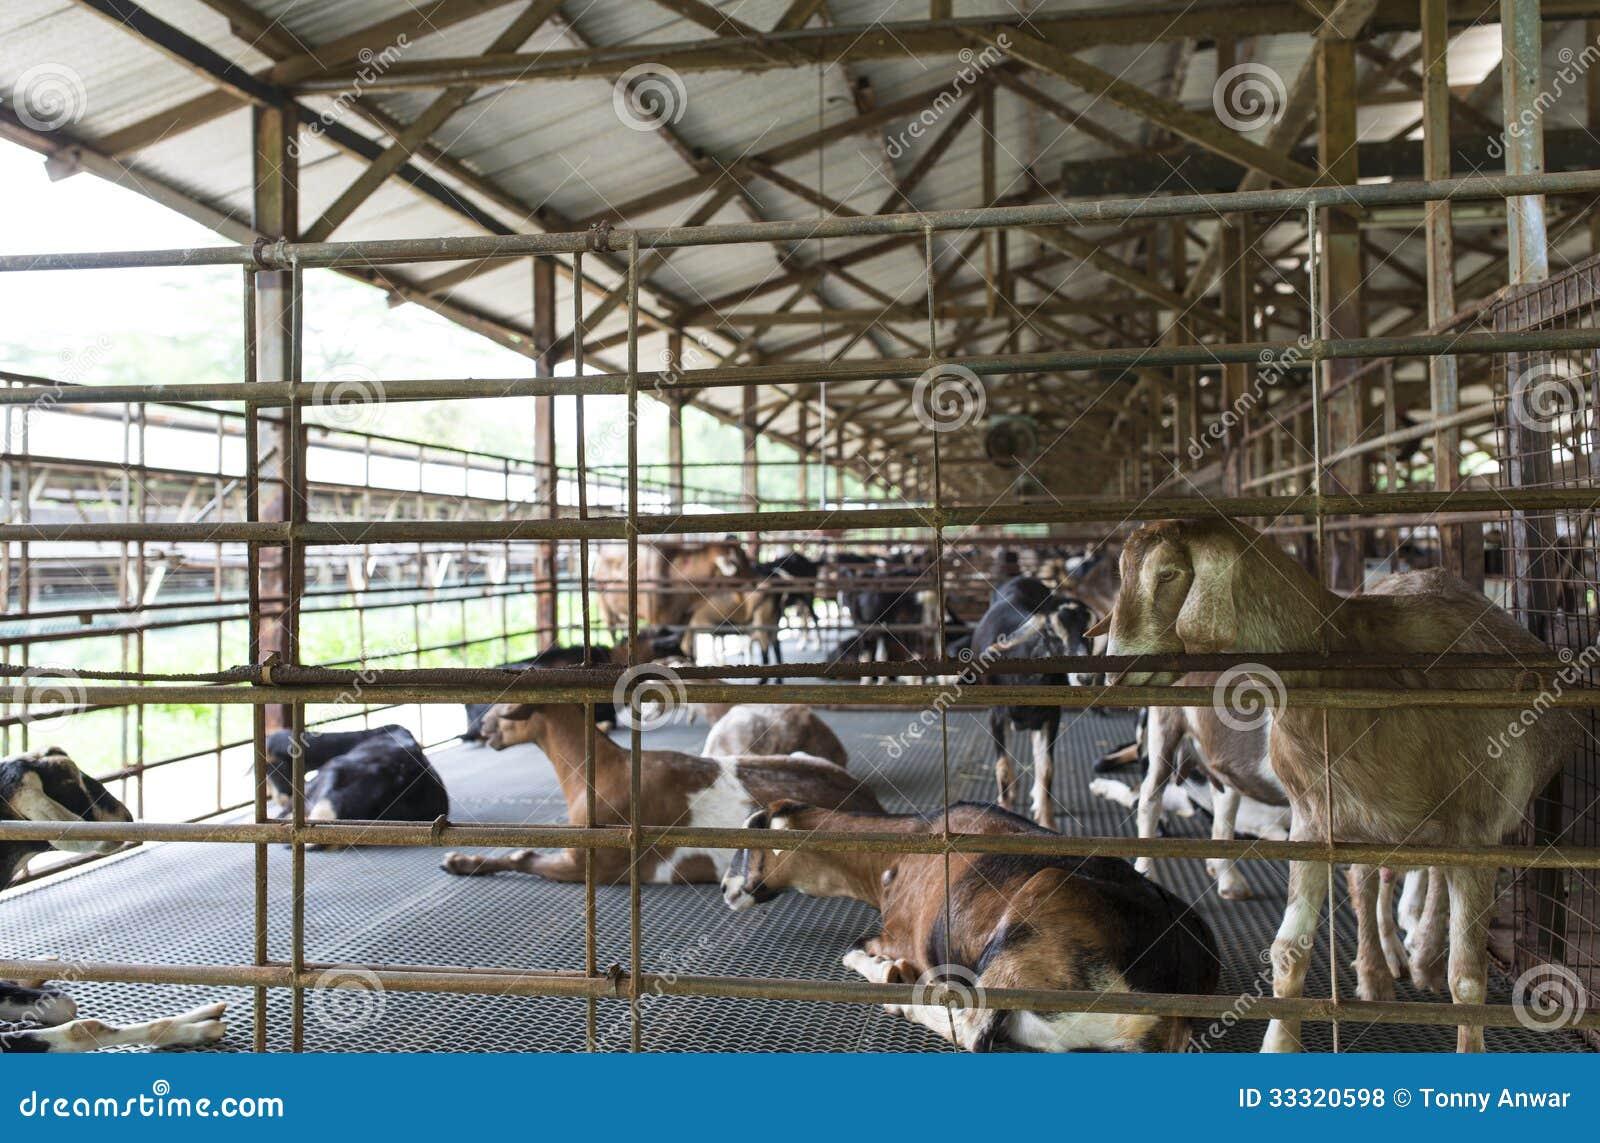 Dairy Goat Inside The Sheltered Pen